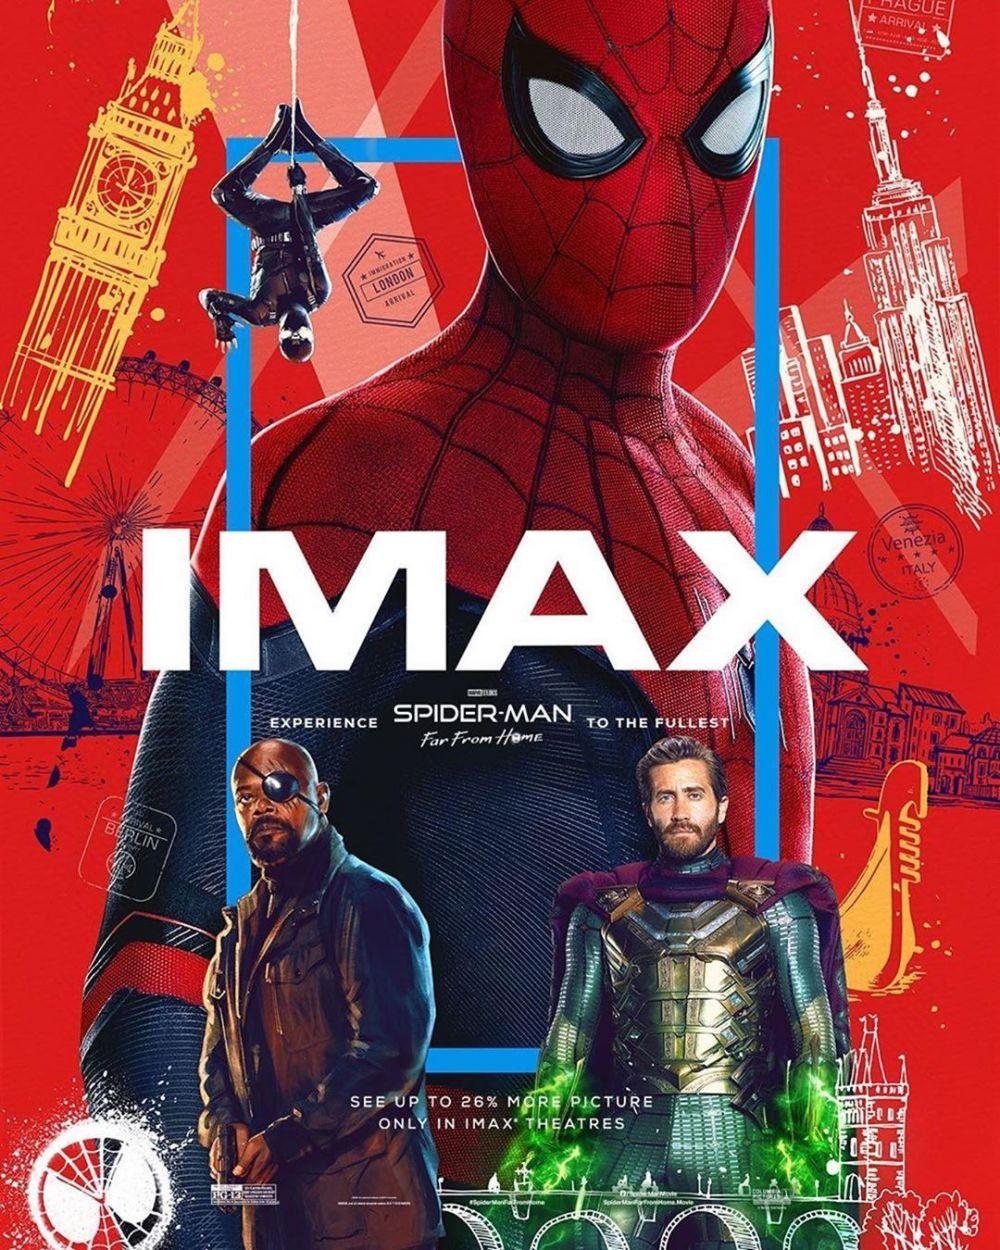 poster film dikritik © 2019 brilio.net